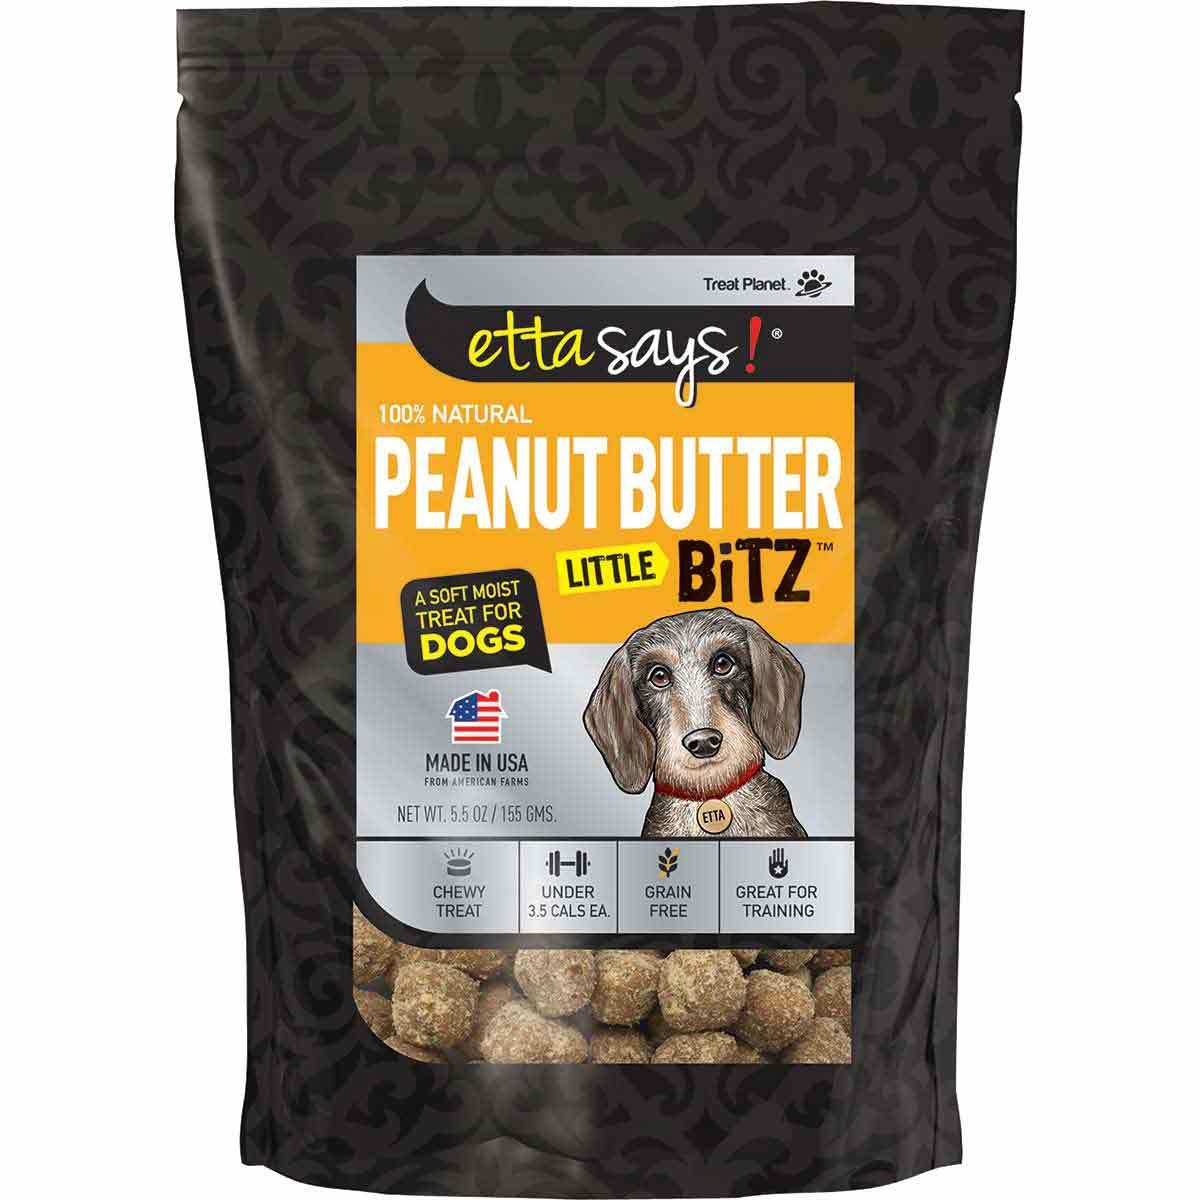 Peanut Butter Etta Says! Little Bitz Training Treats 5.5 oz